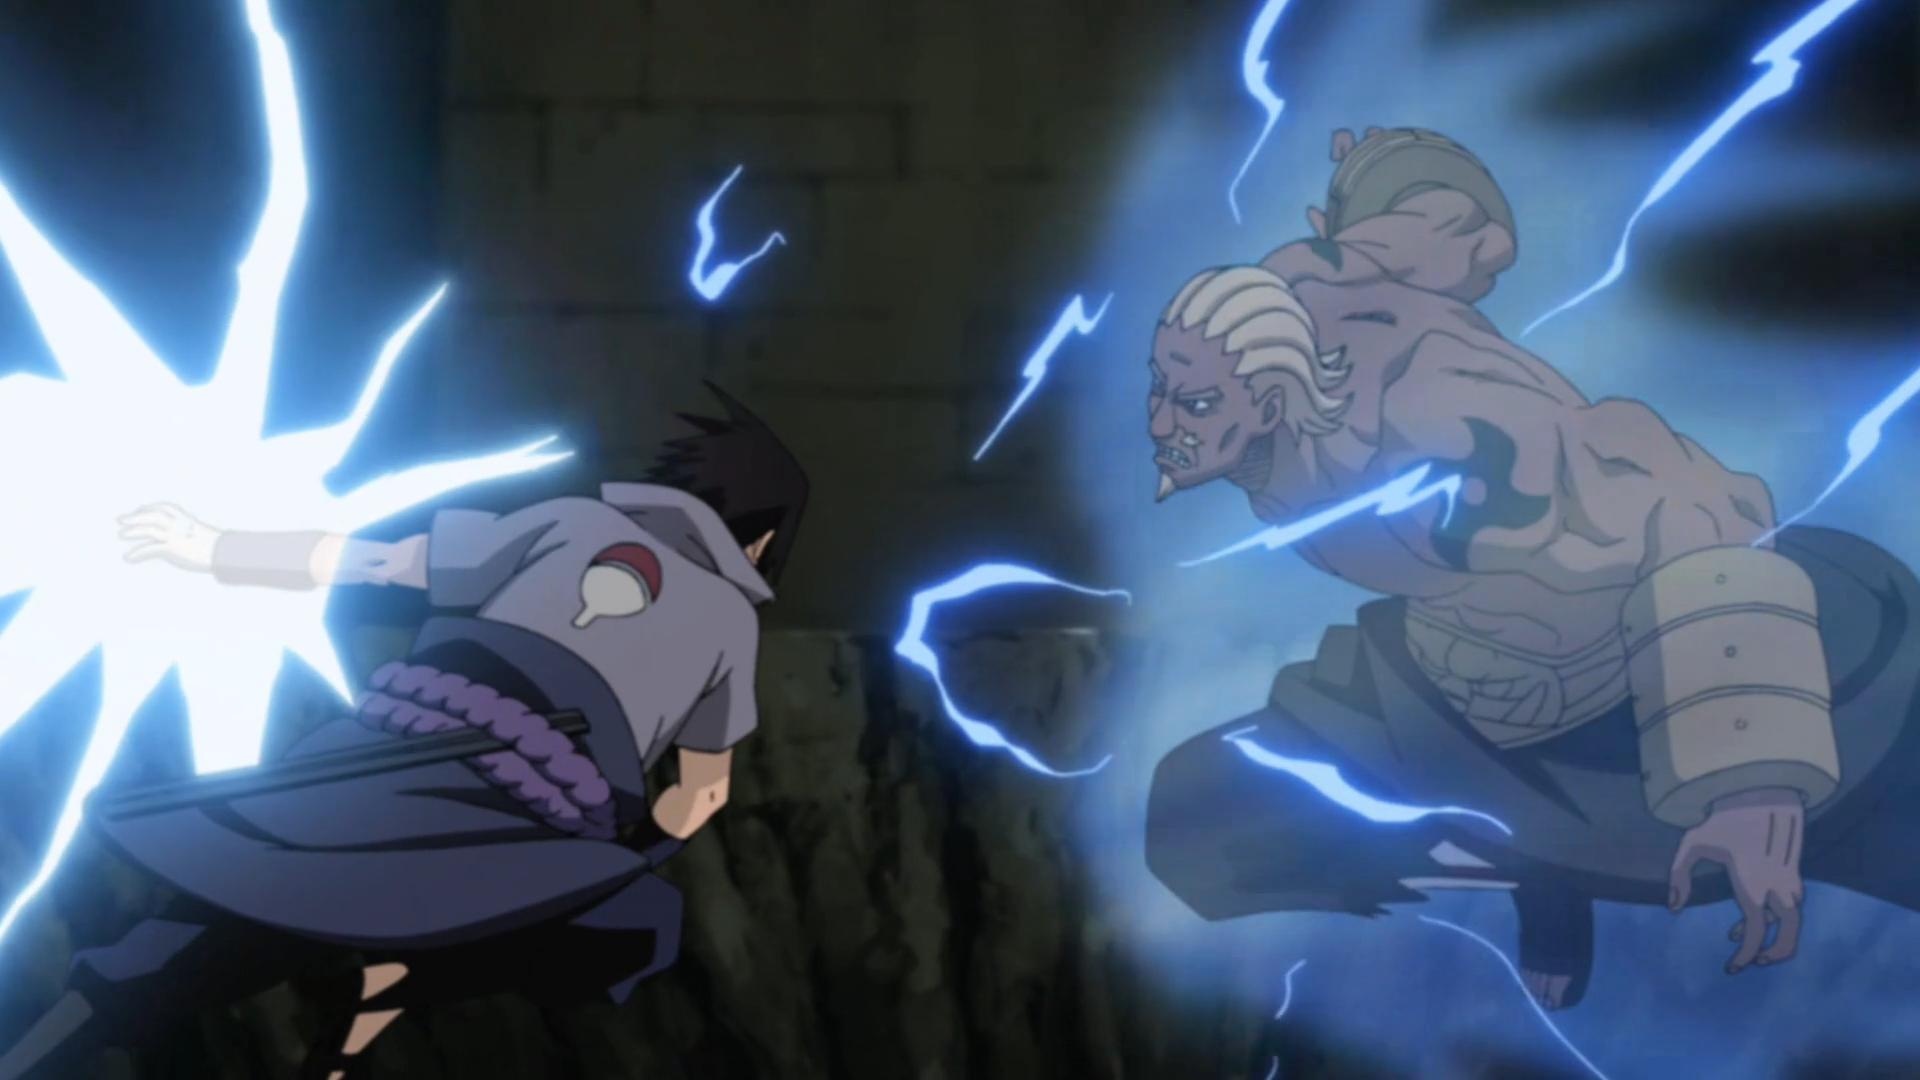 Five kage summit arc narutopedia the naruto - Naruto as sasuke ...